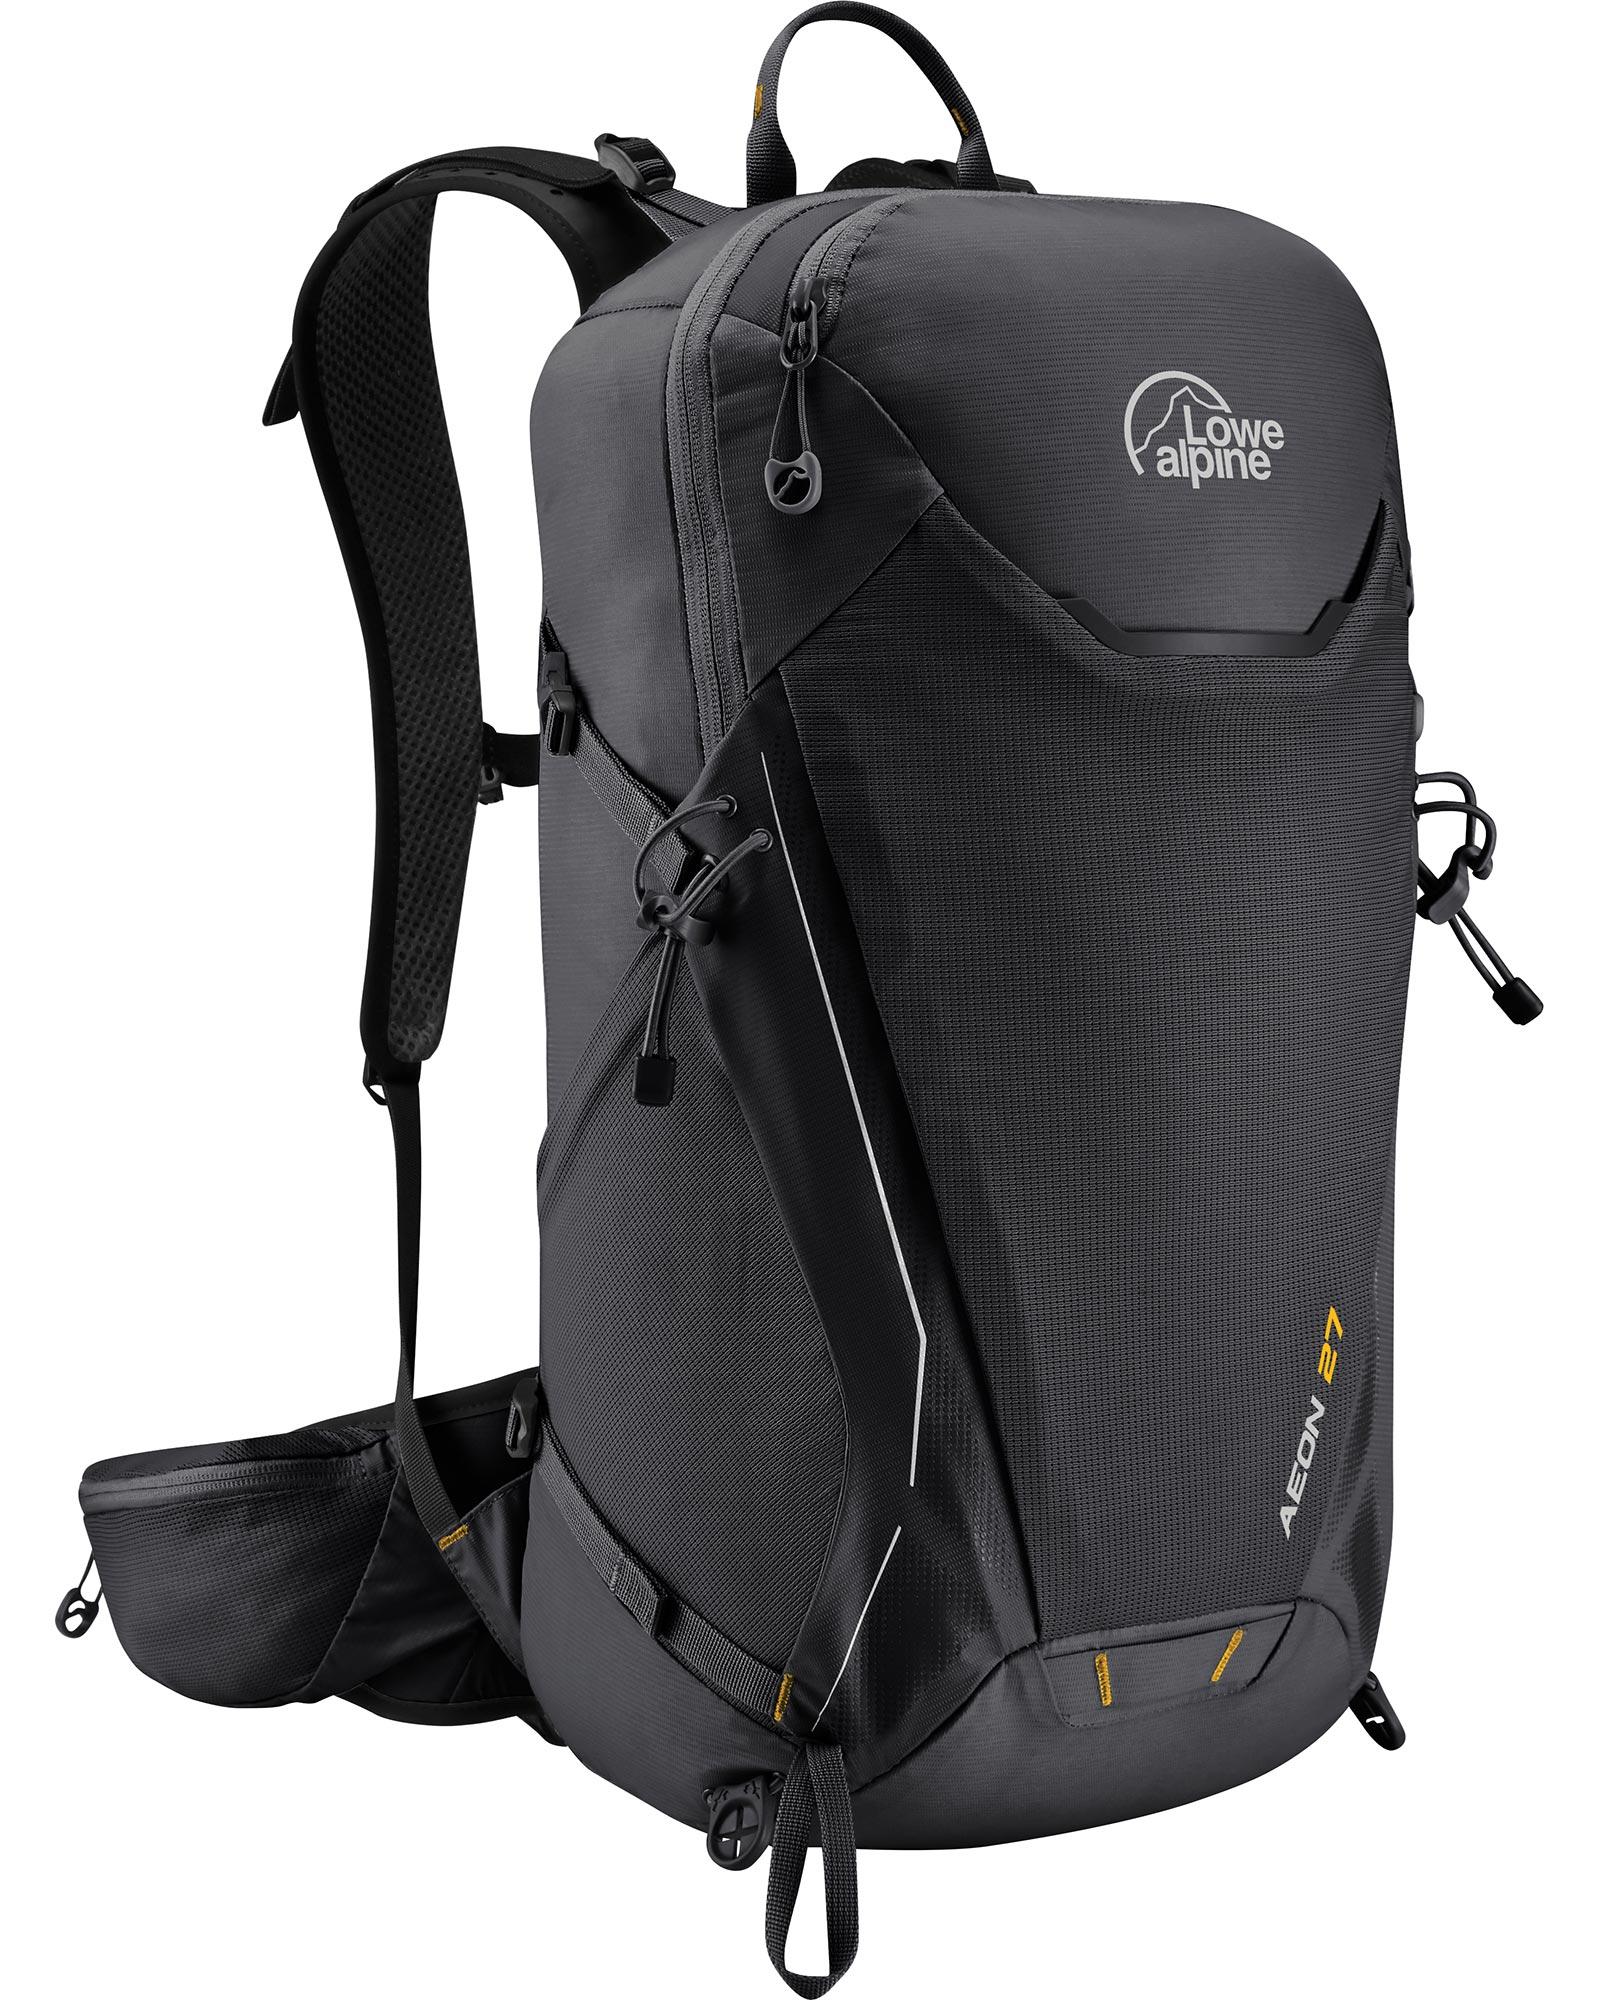 Lowe Alpine Aeon 27 Backpack 0